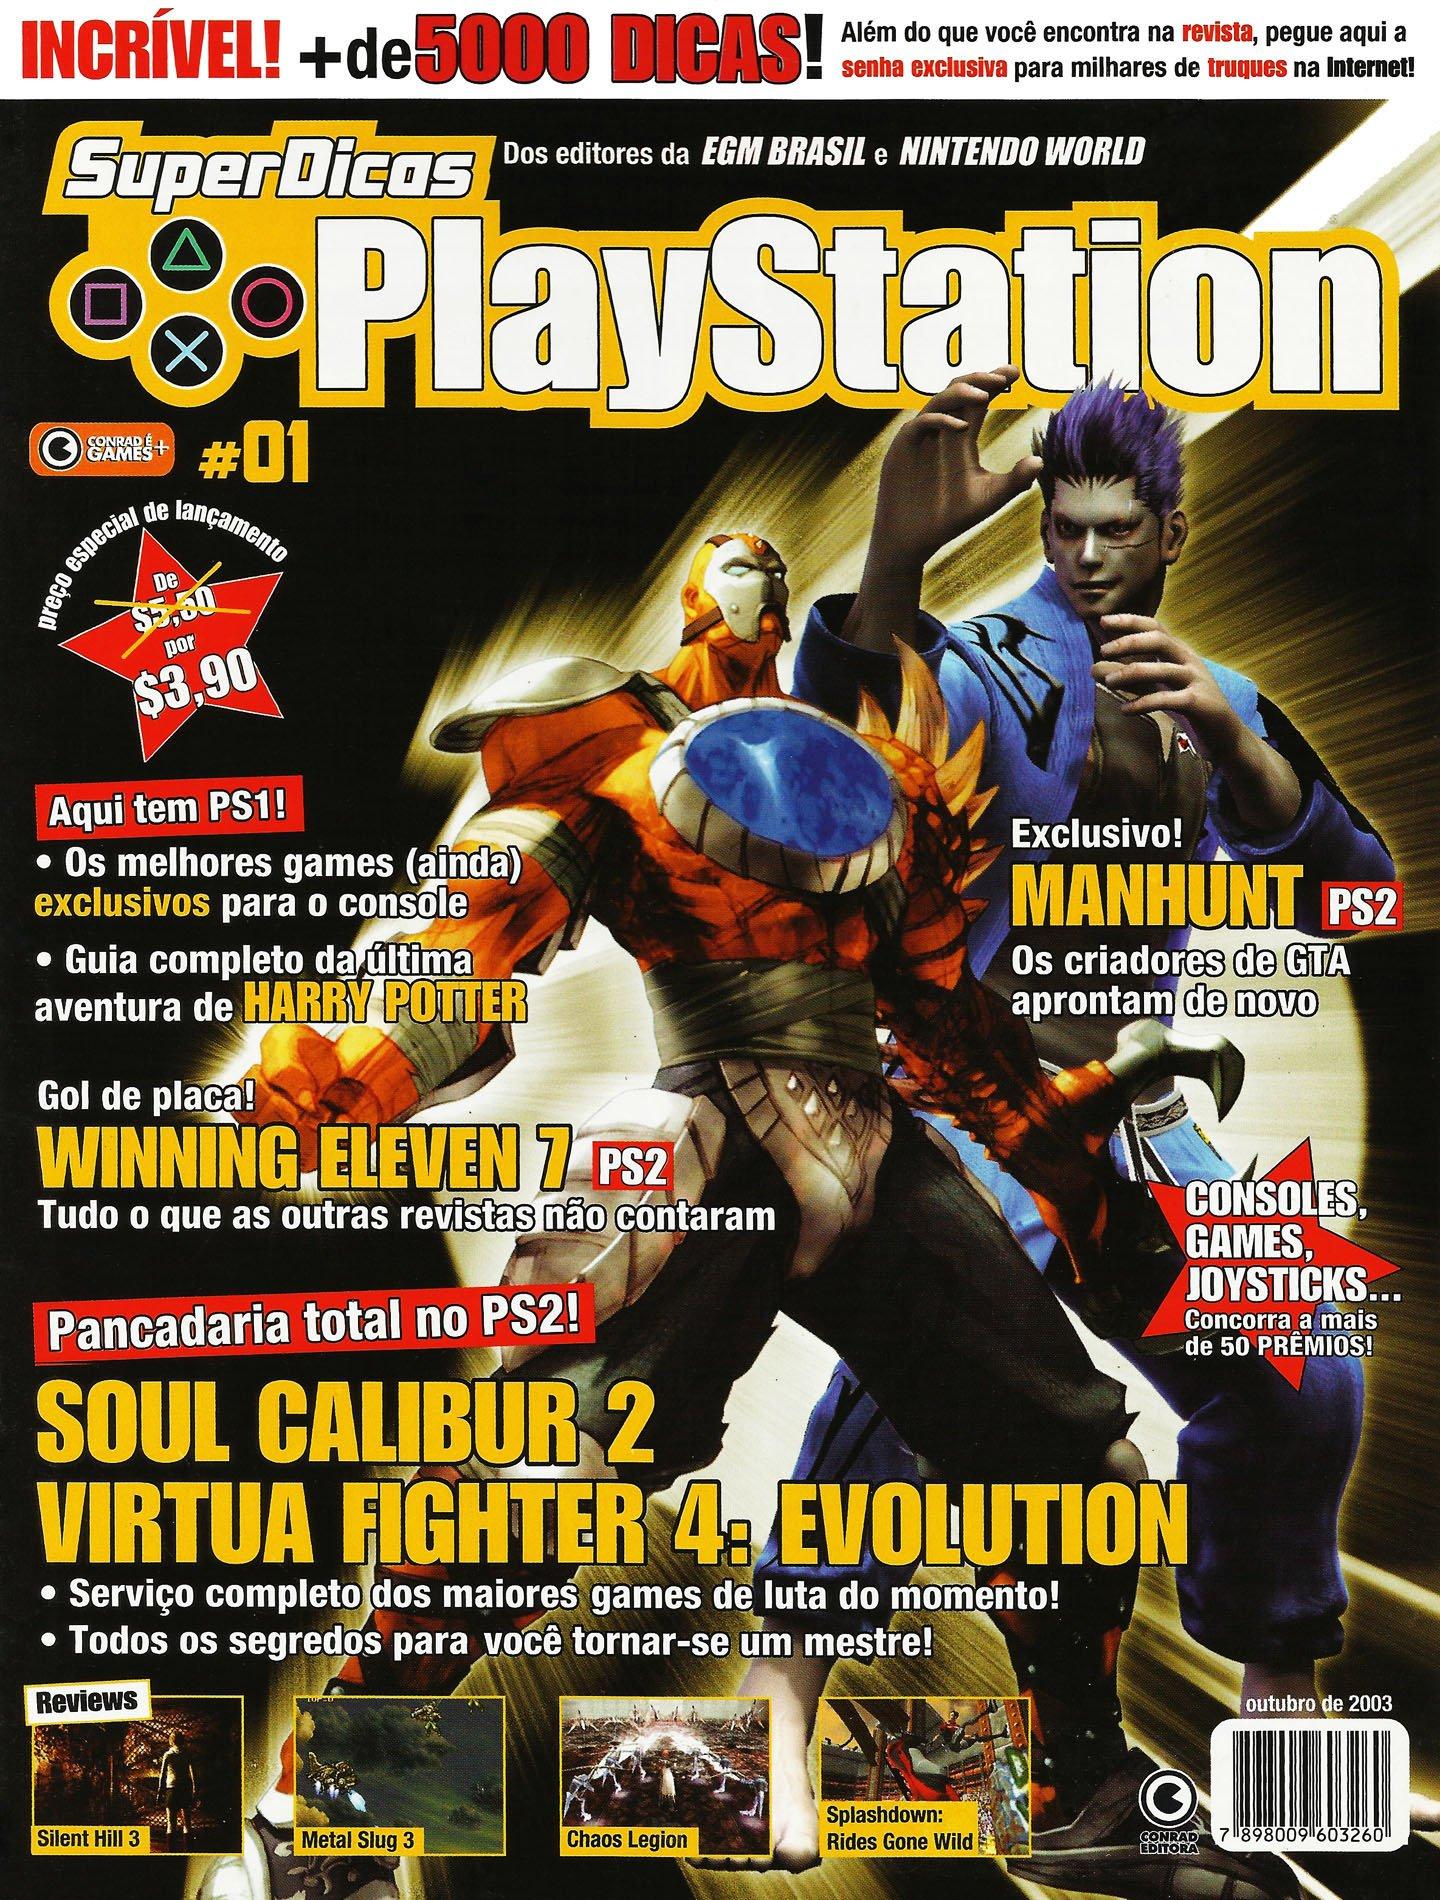 Super Dicas Playstation 01 (October 2003)